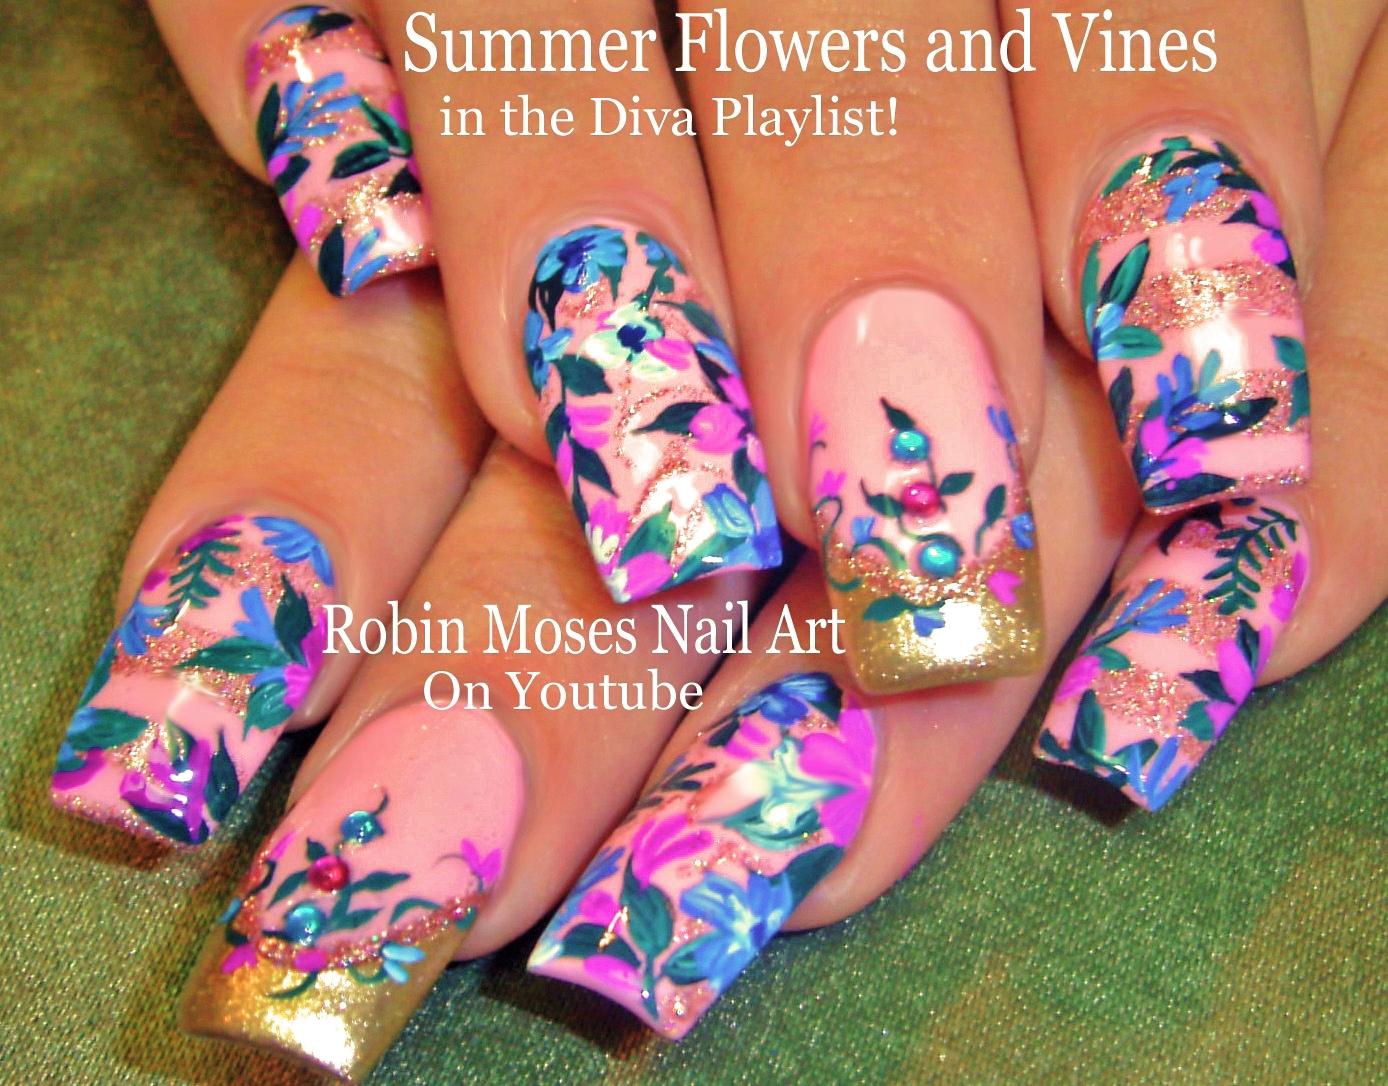 Nail Art by Robin Moses Pink Floral Diva Nails Up Today See Lots